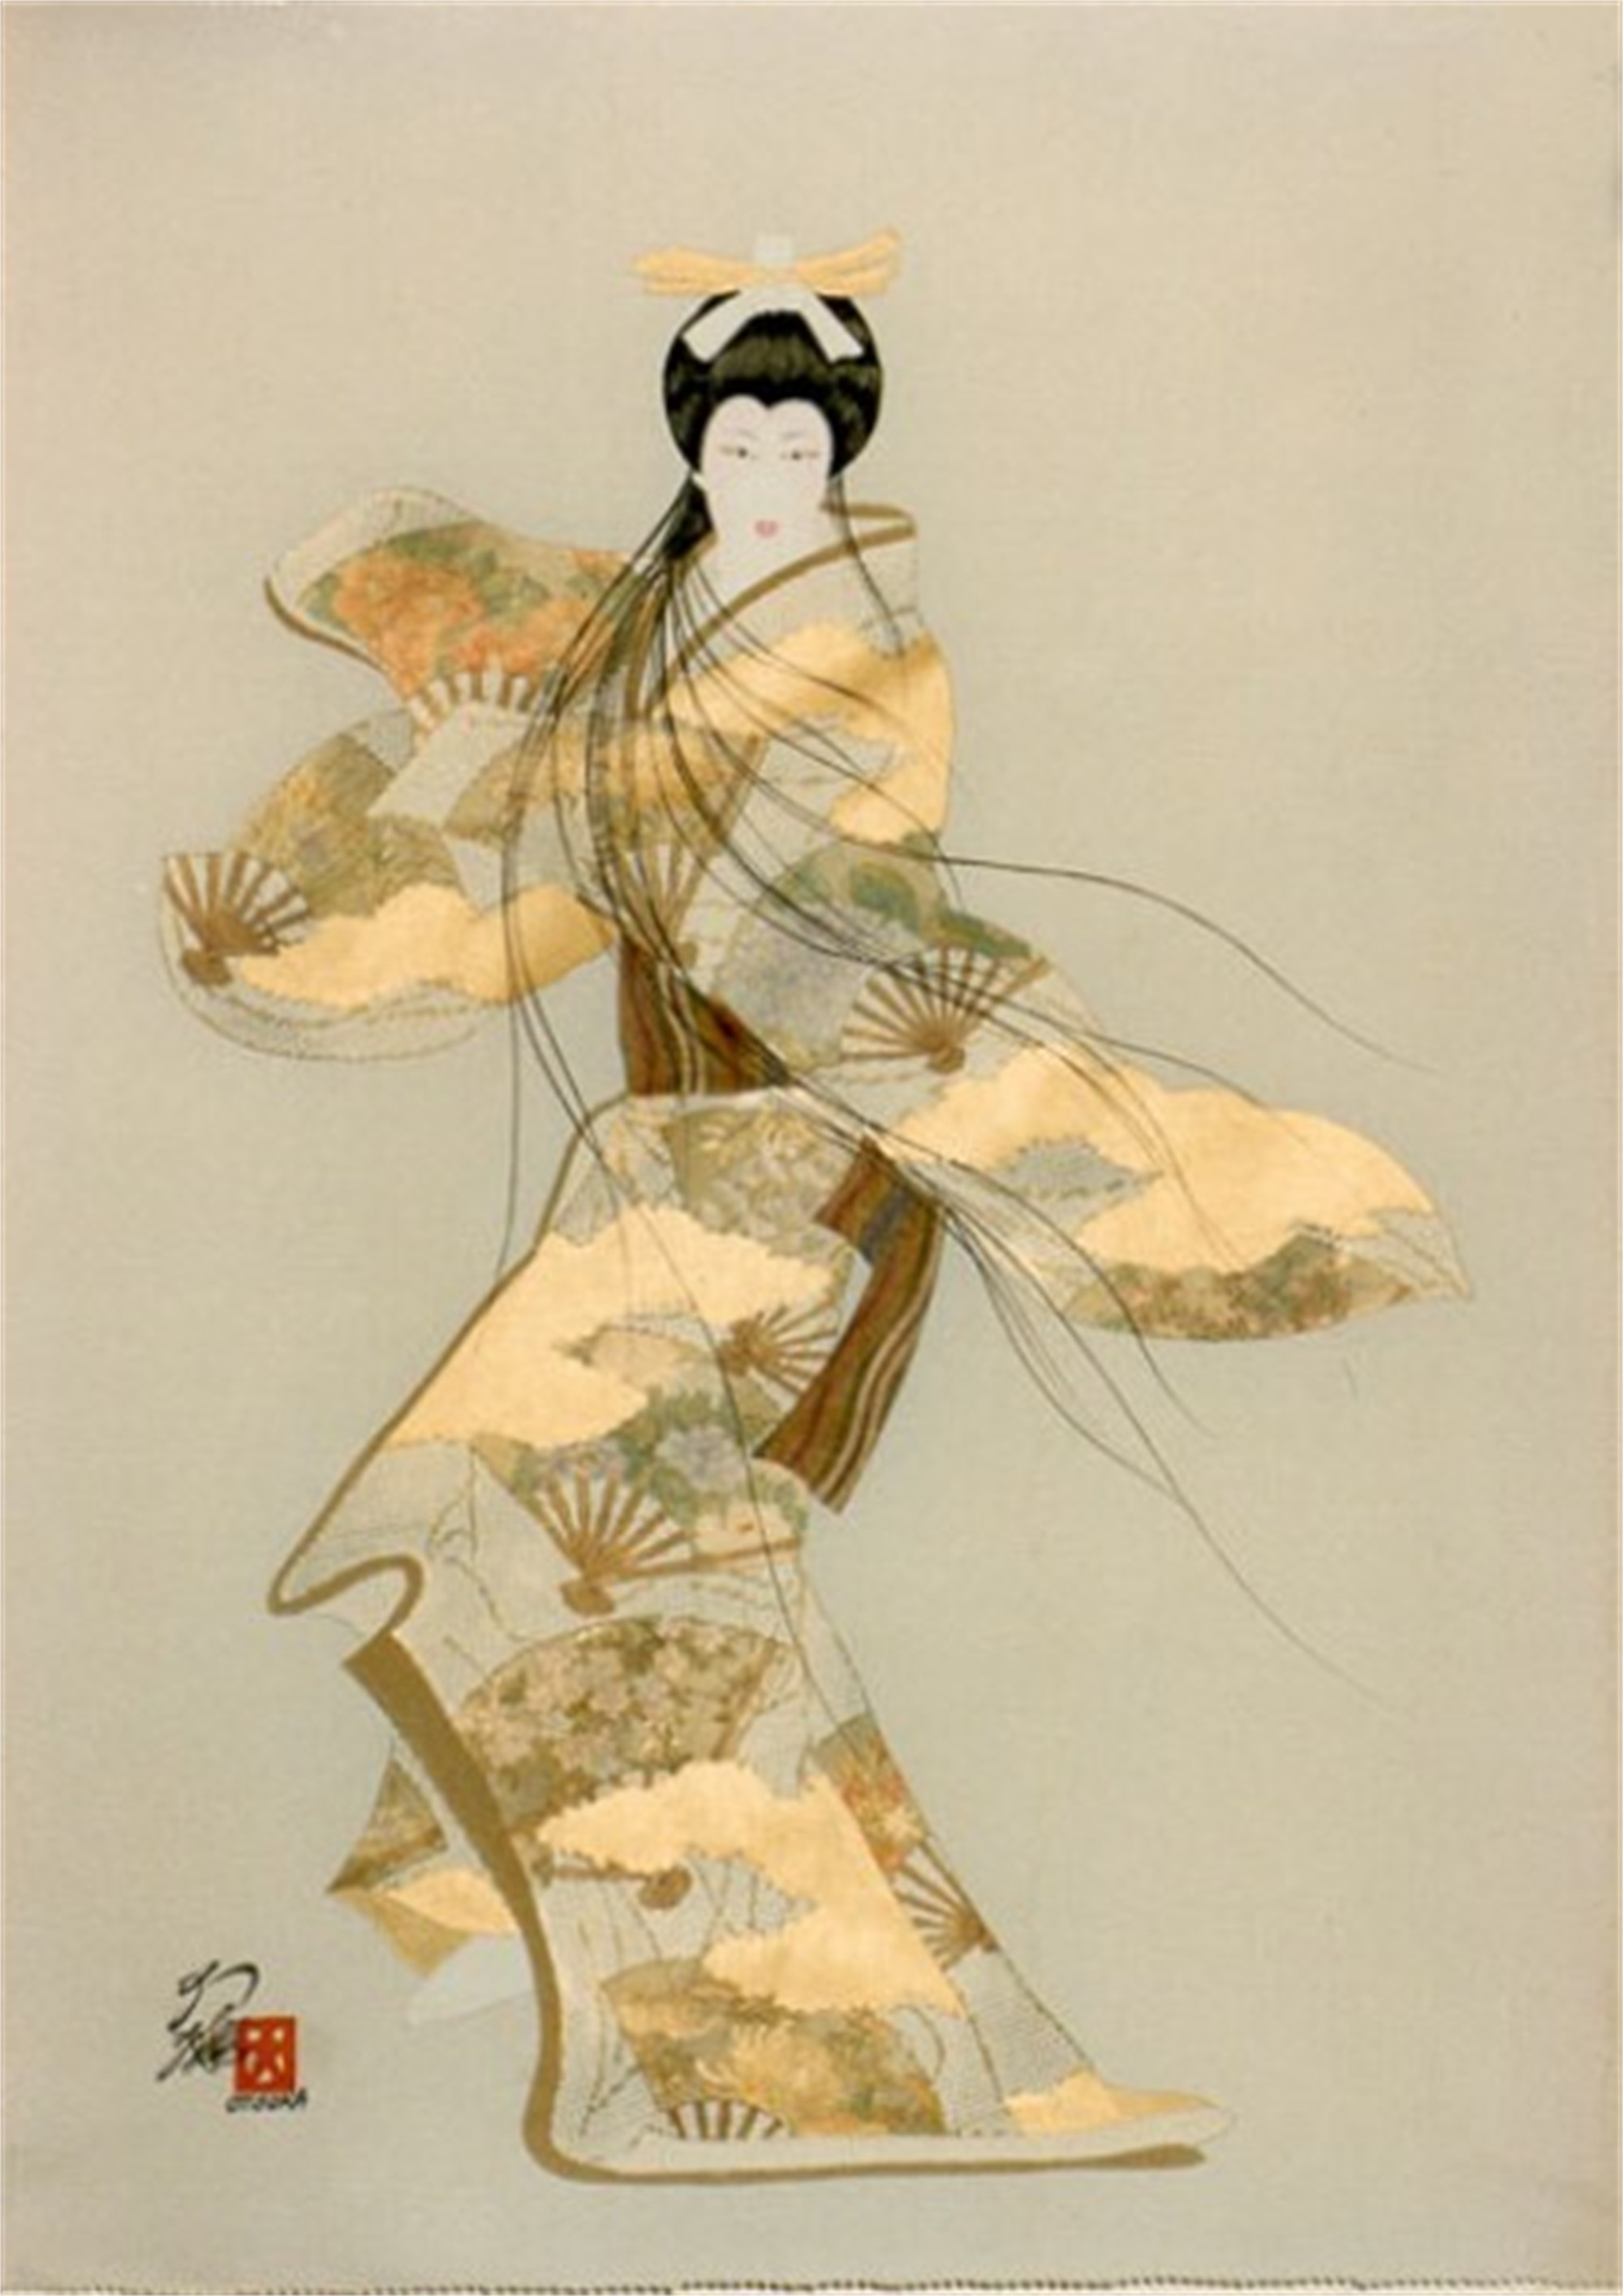 Lady Mieko - Autumn by Hisashi Otsuka